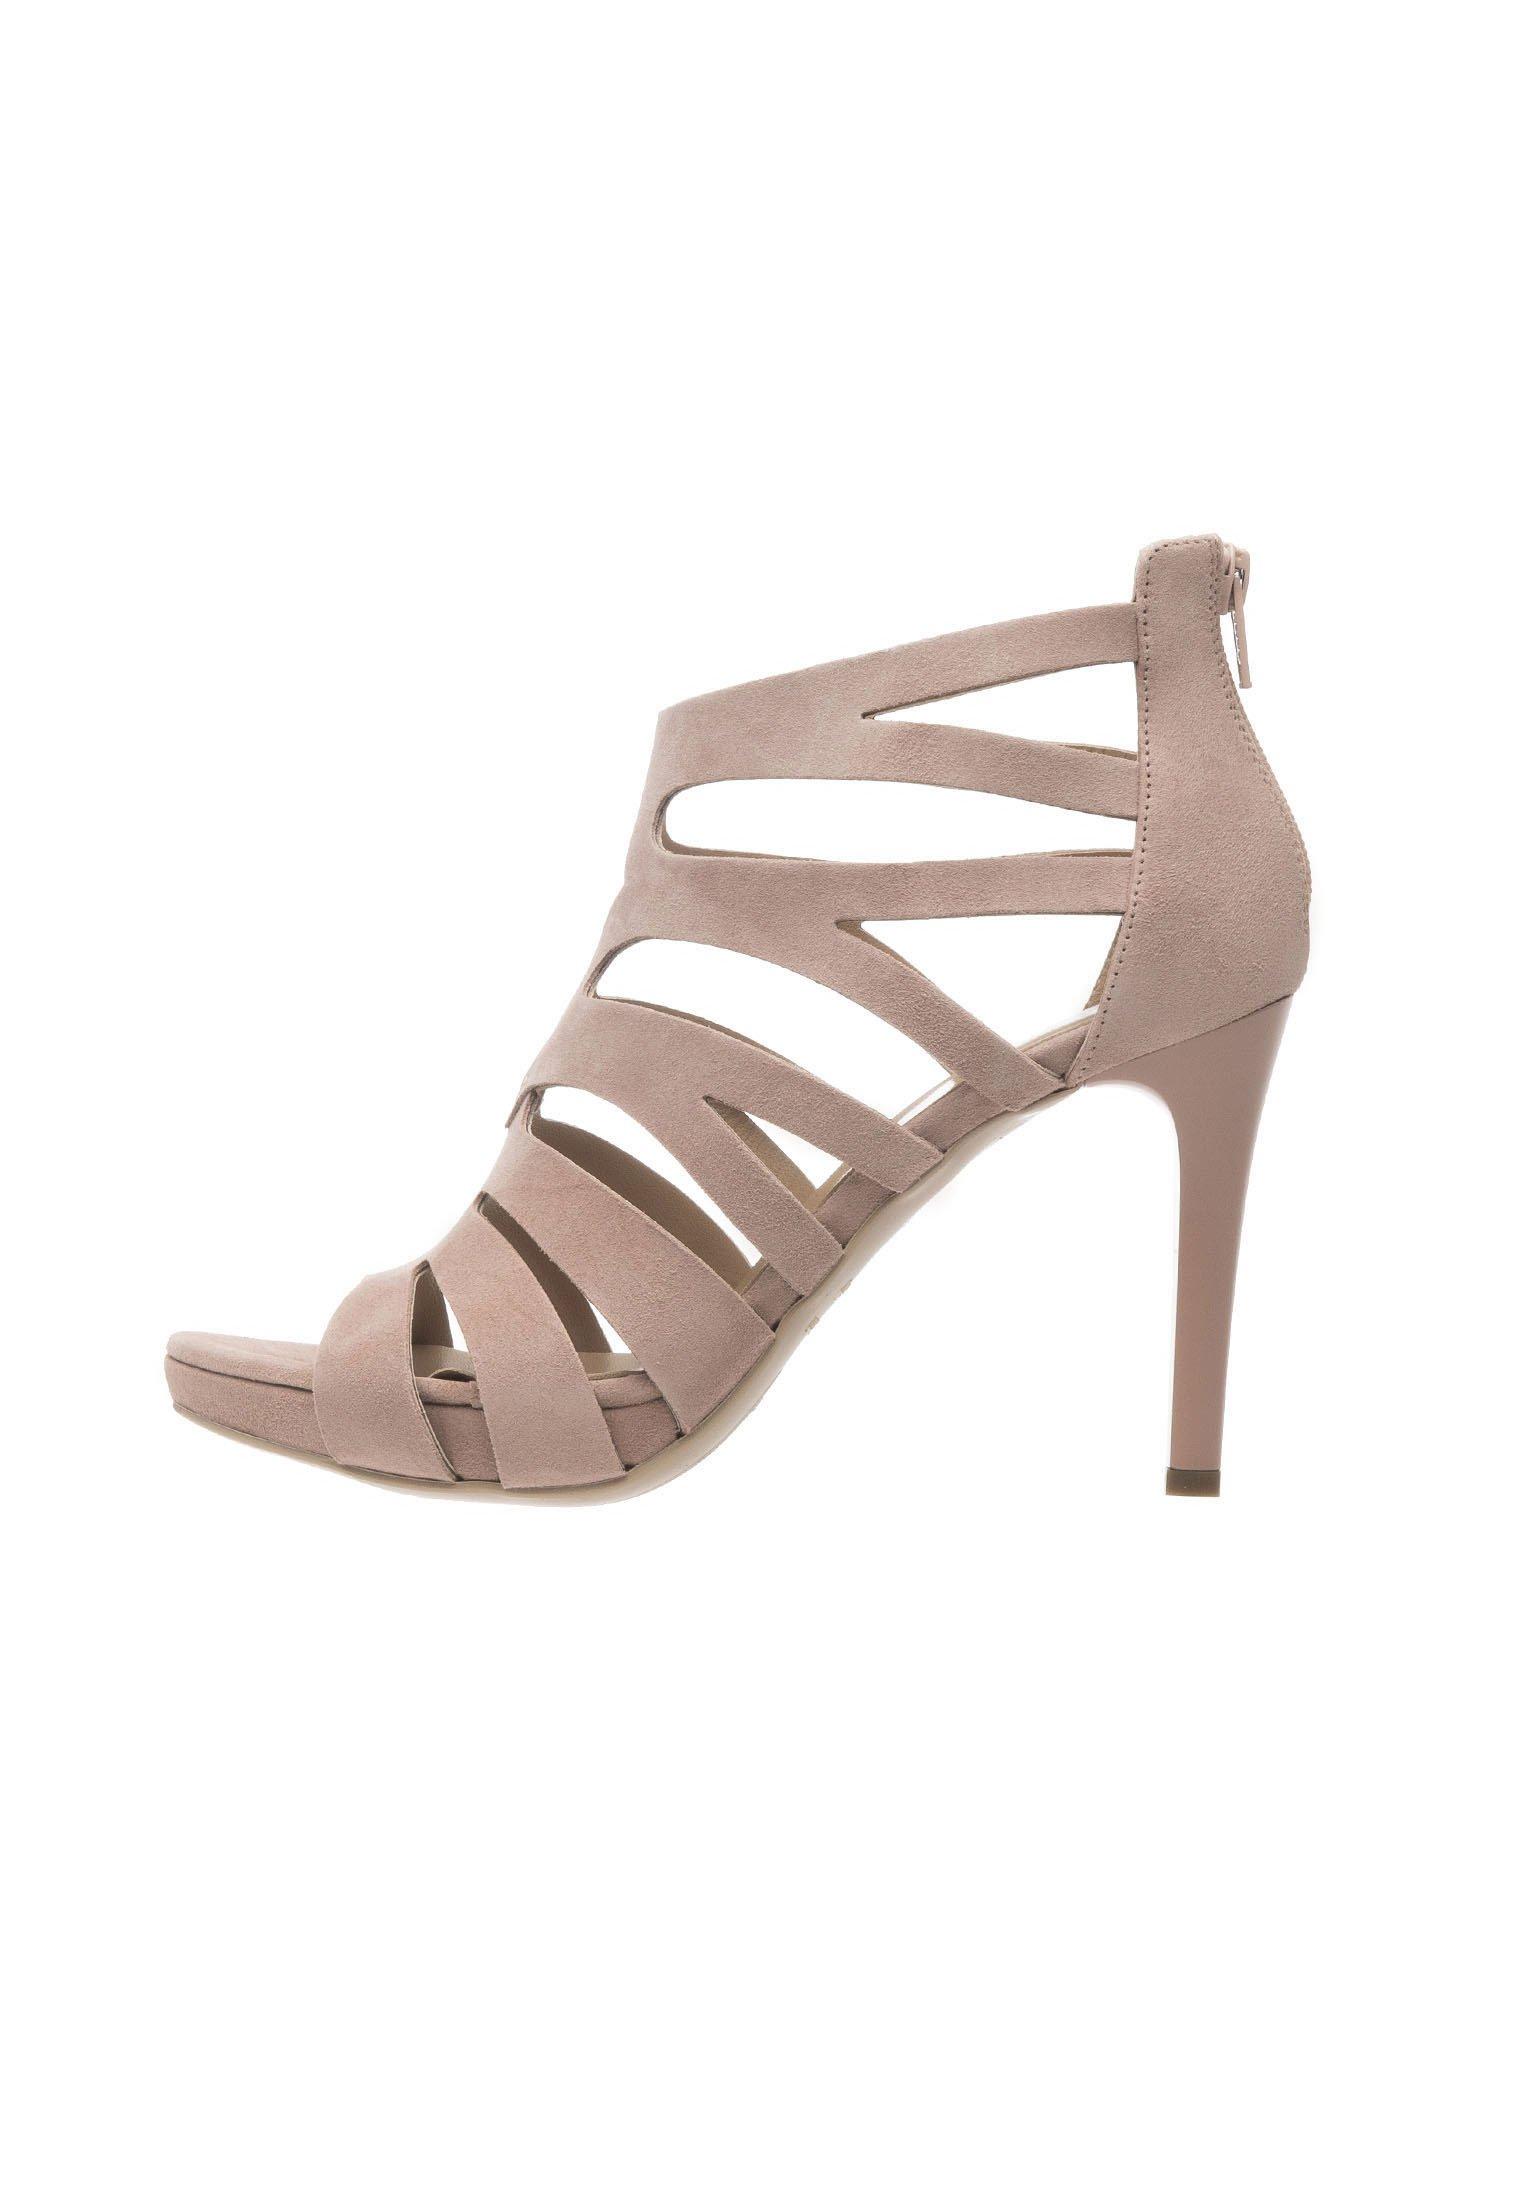 Damen High Heel Sandalette